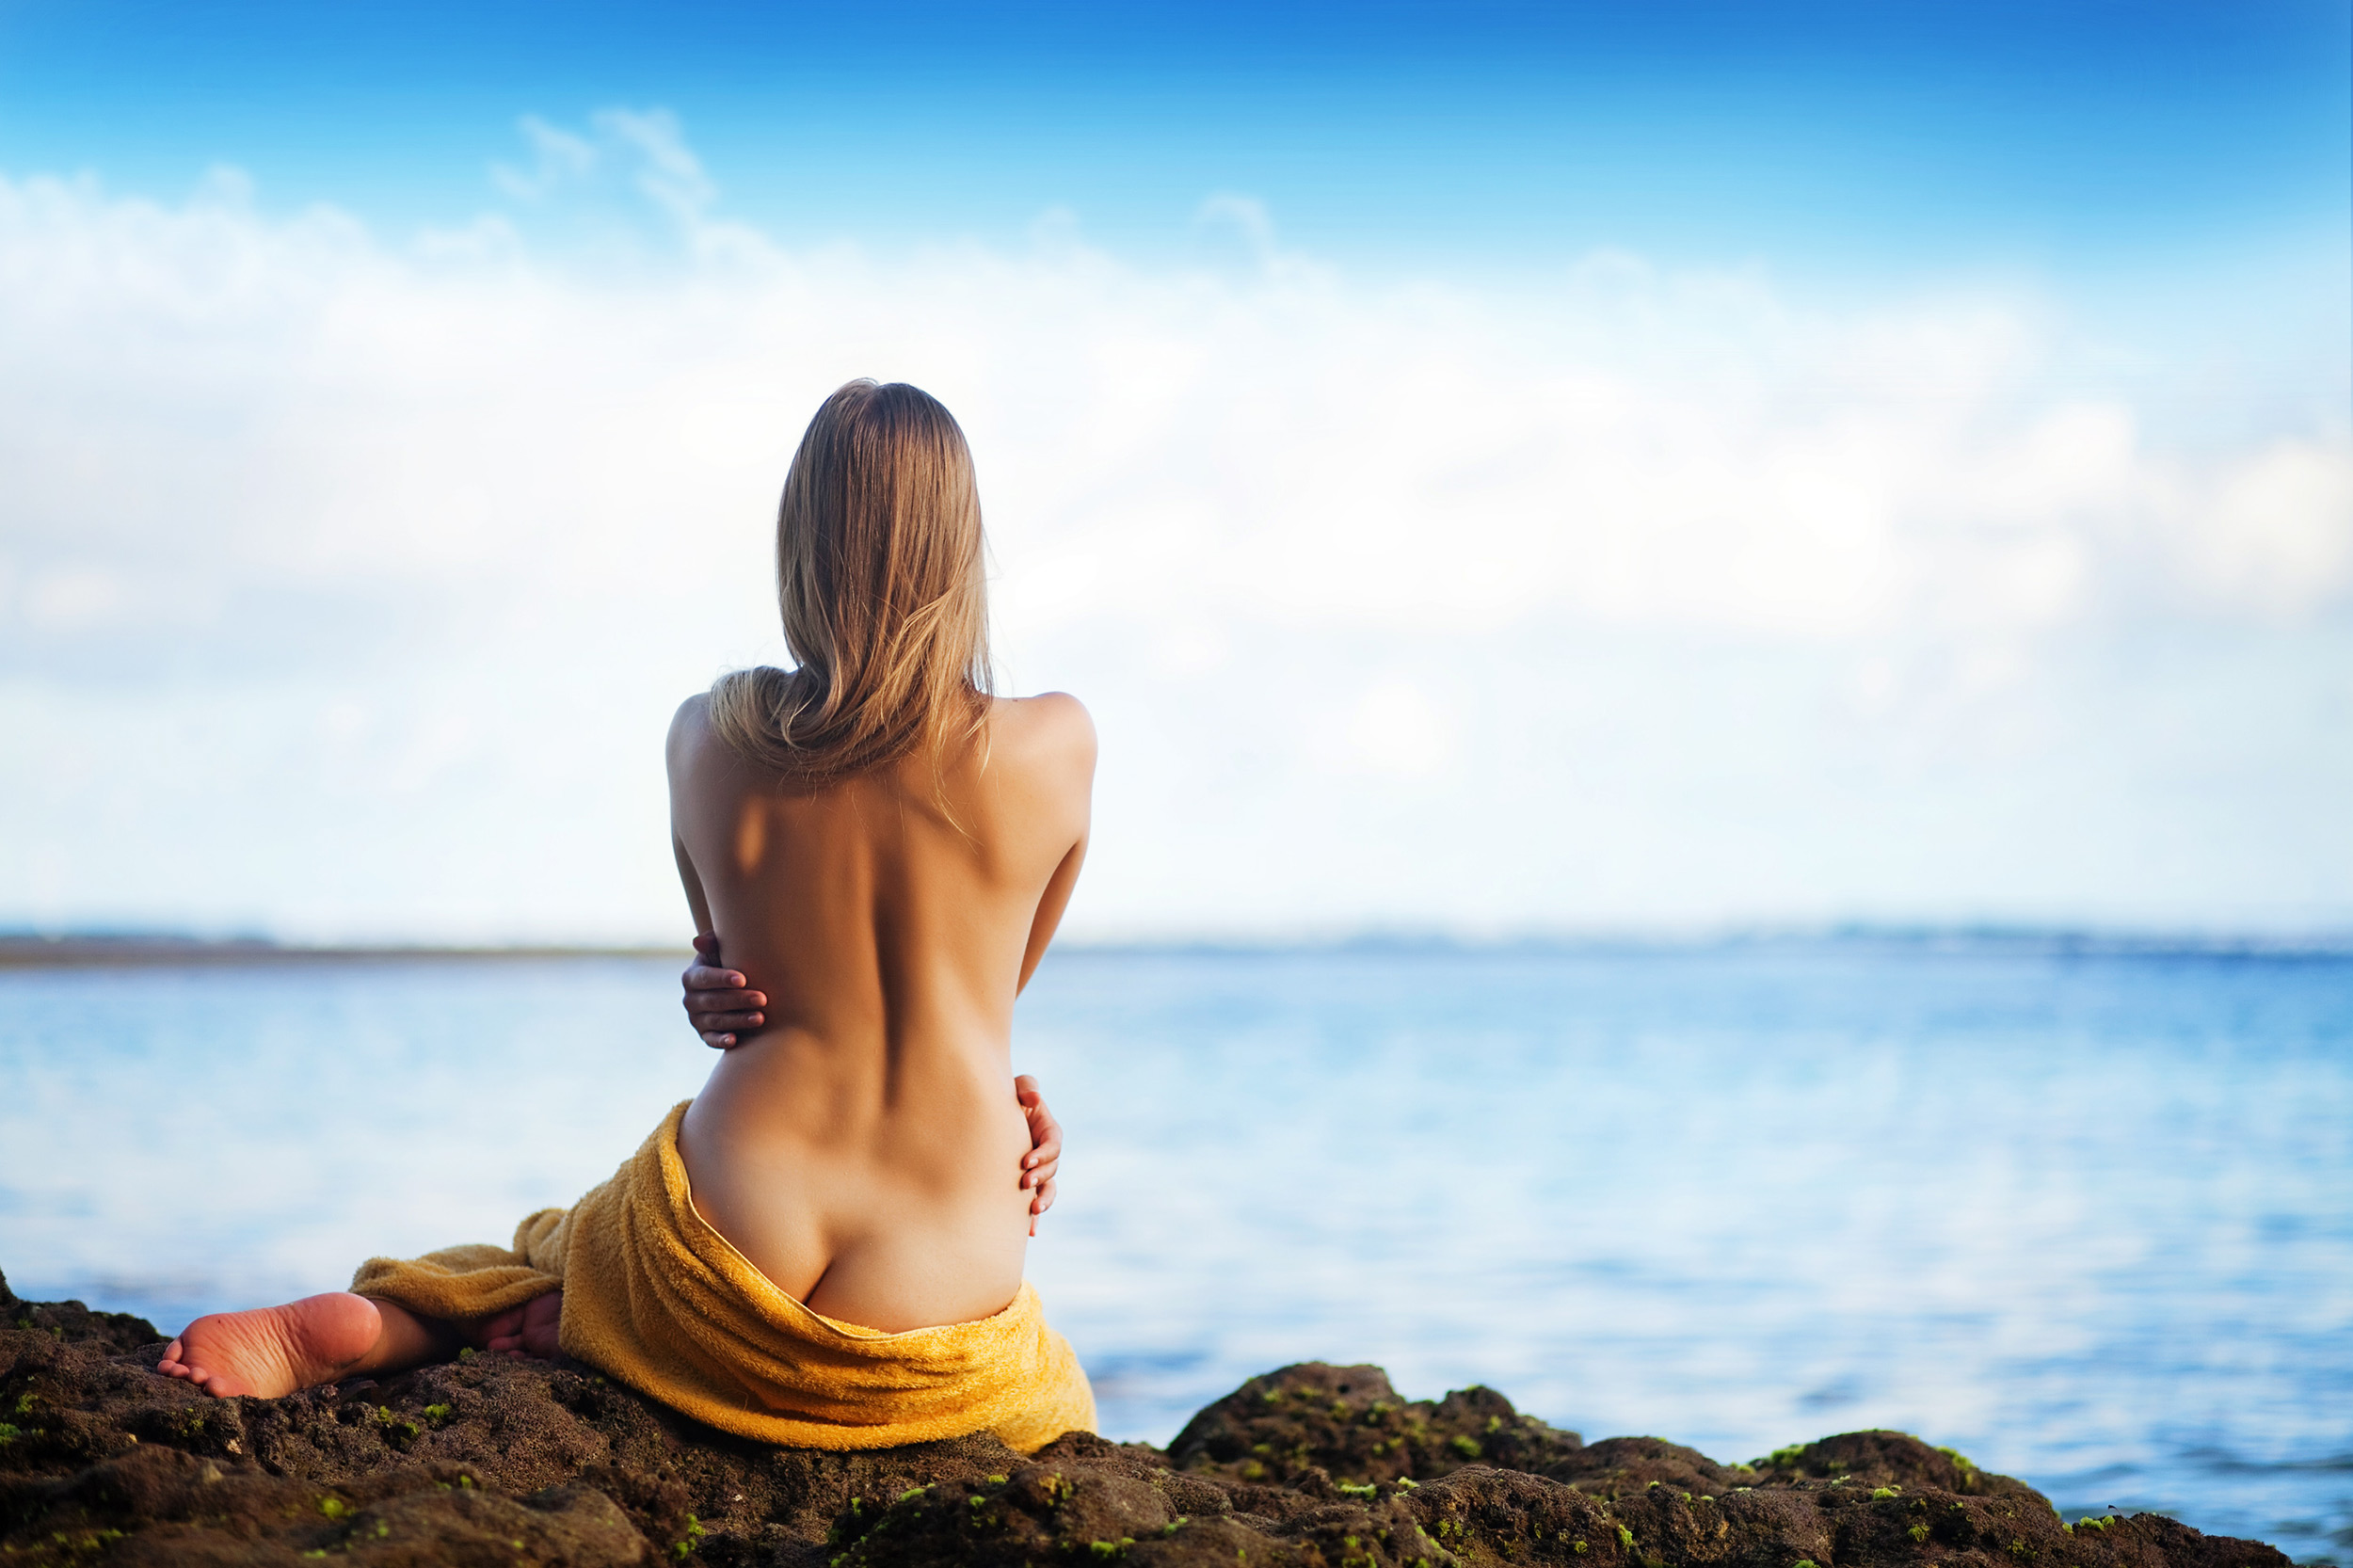 Urlaub nackt FKK Urlaub: